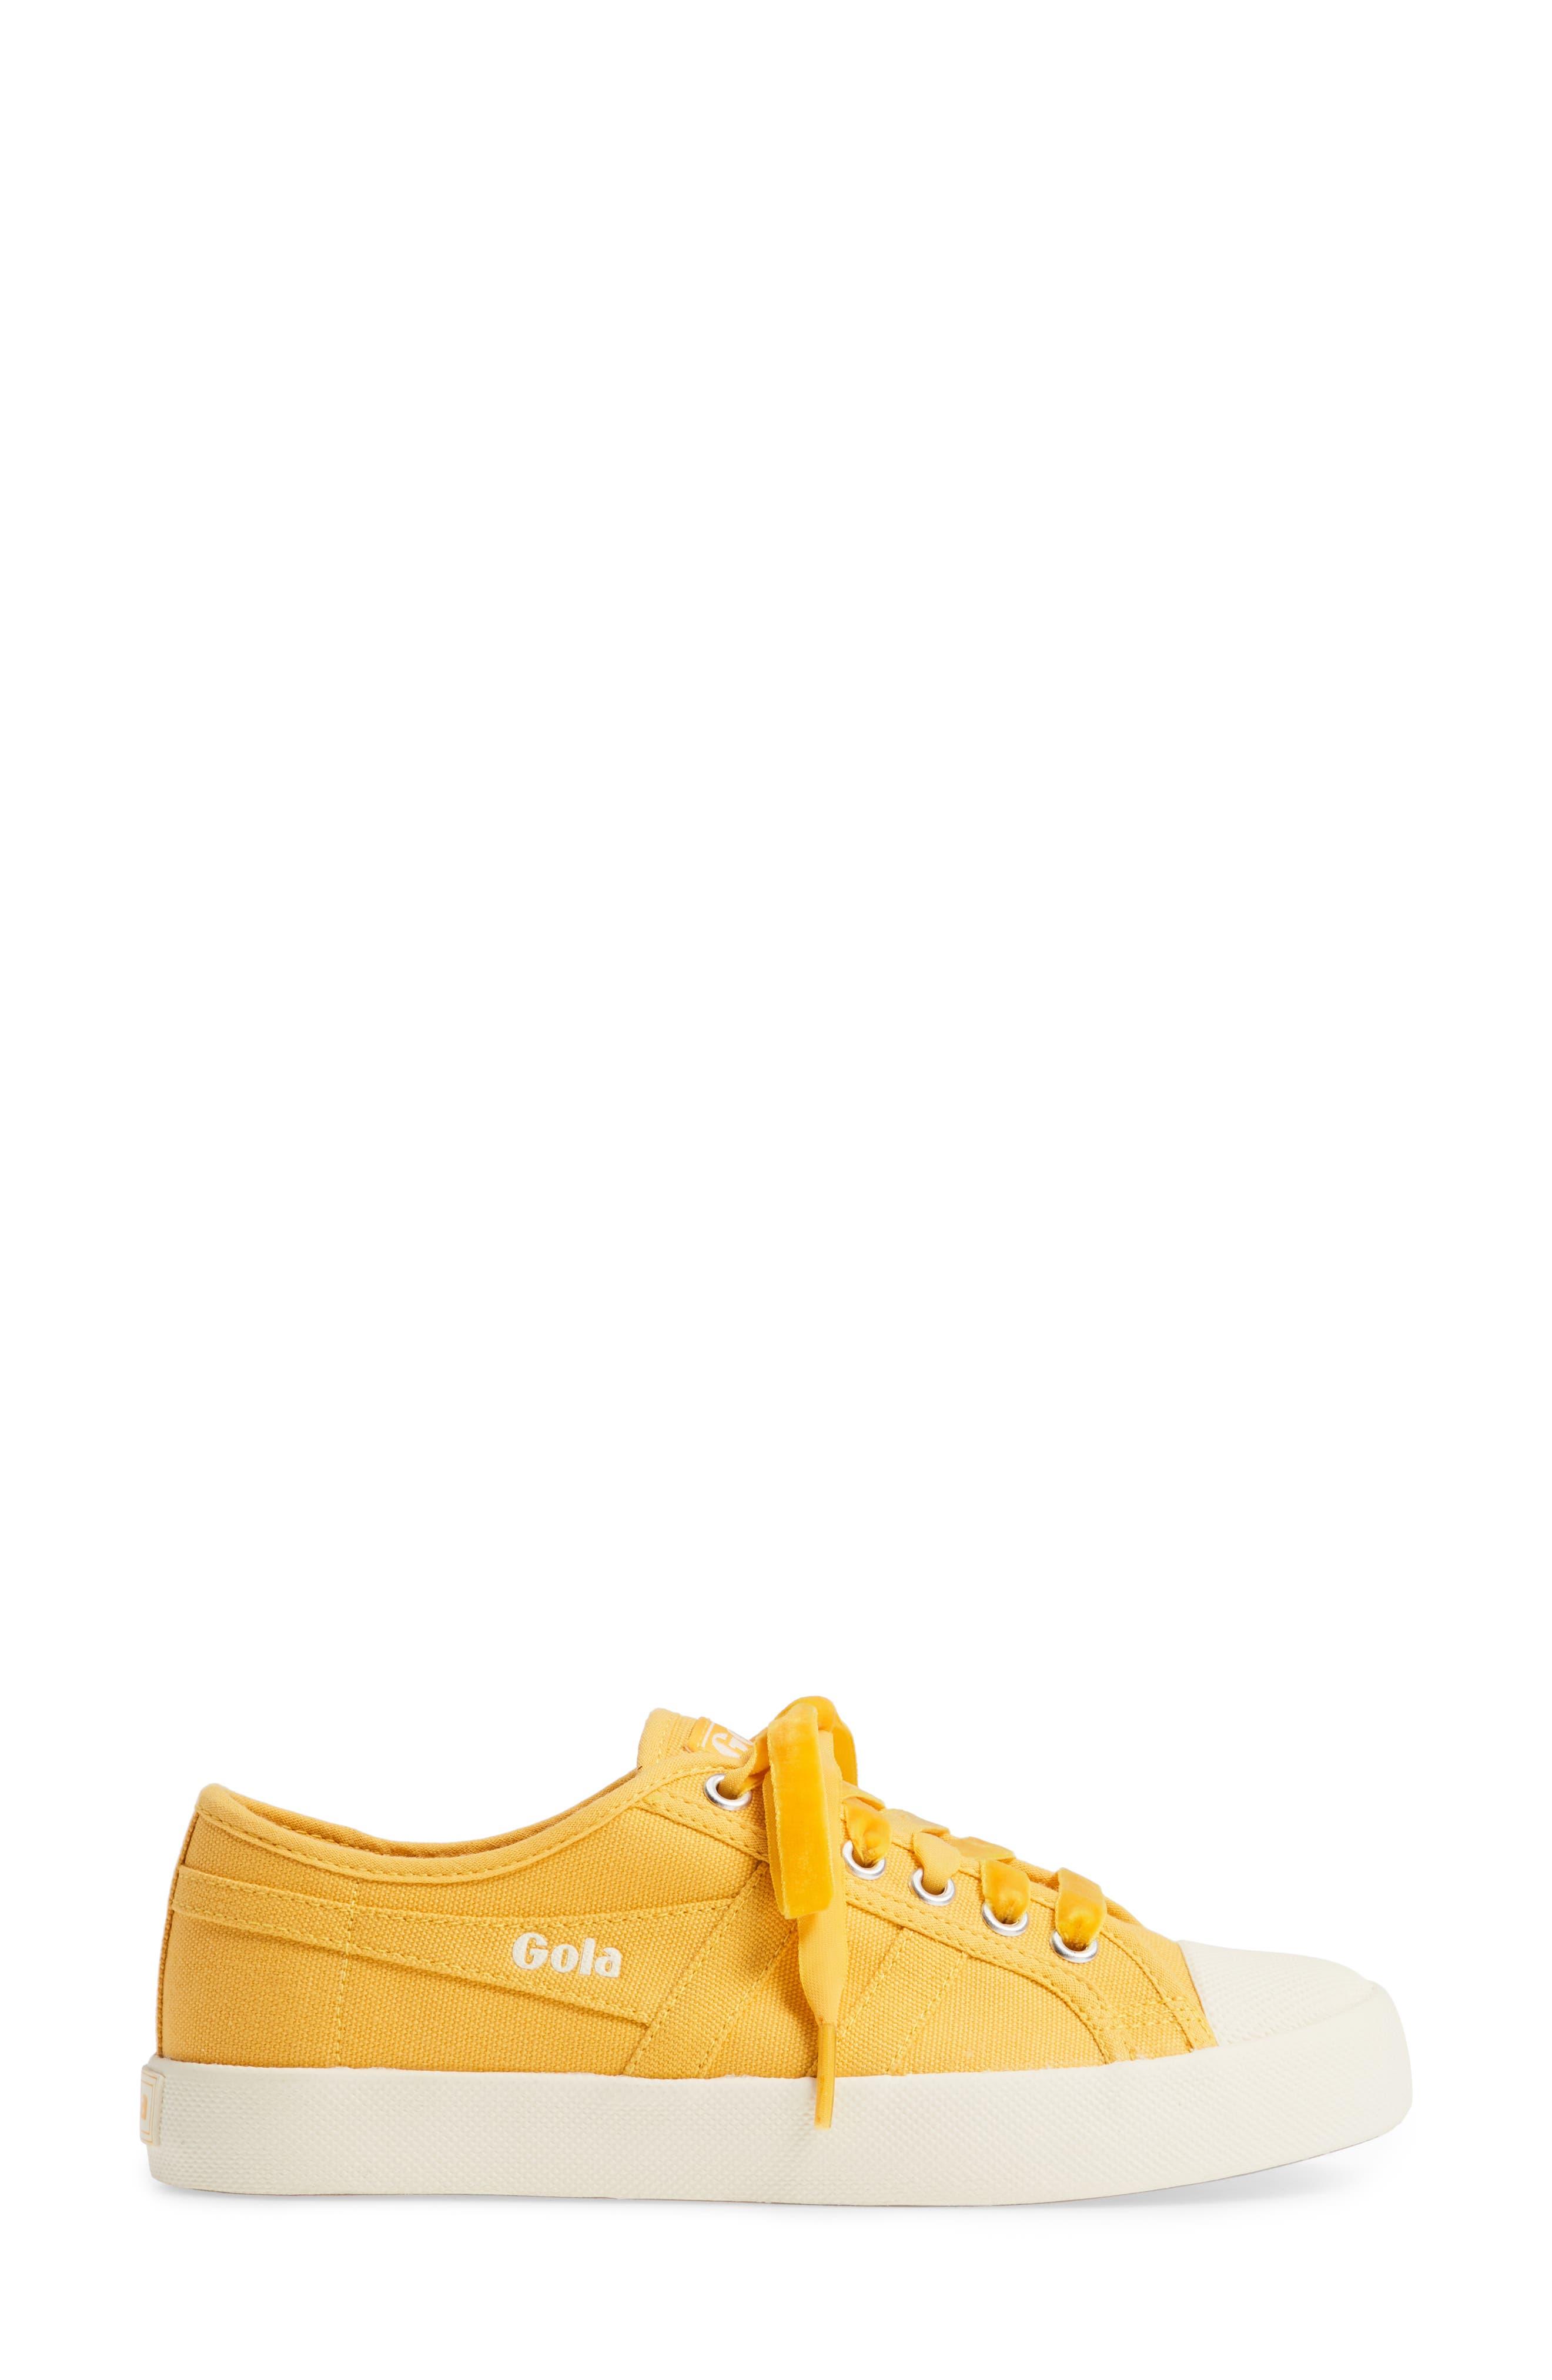 Coaster Sneaker,                             Alternate thumbnail 3, color,                             SUN/ OFF WHITE